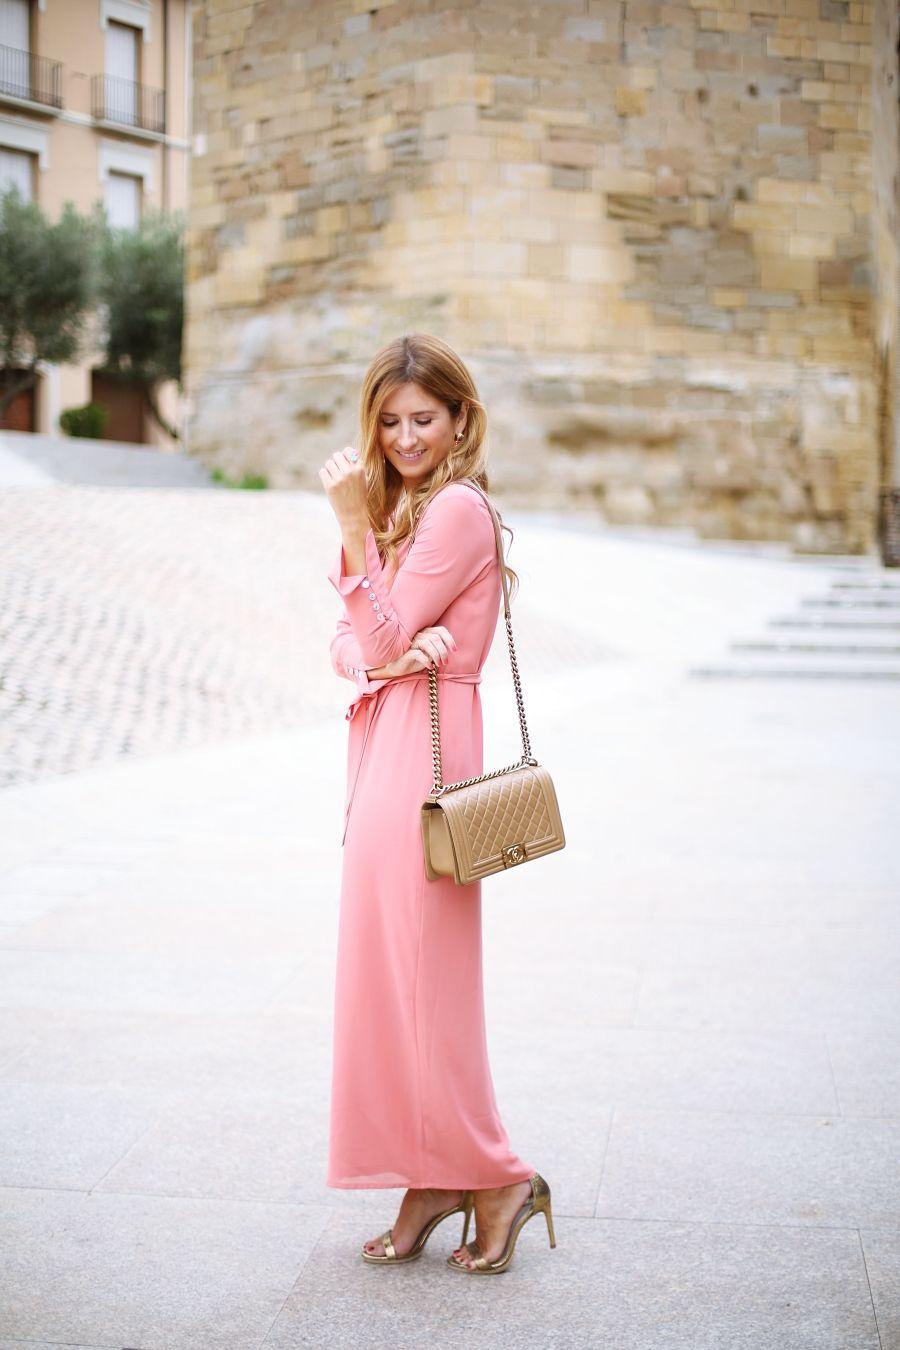 PINK DRESS AND PERFECT MAKE UP | Pinterest | Boda